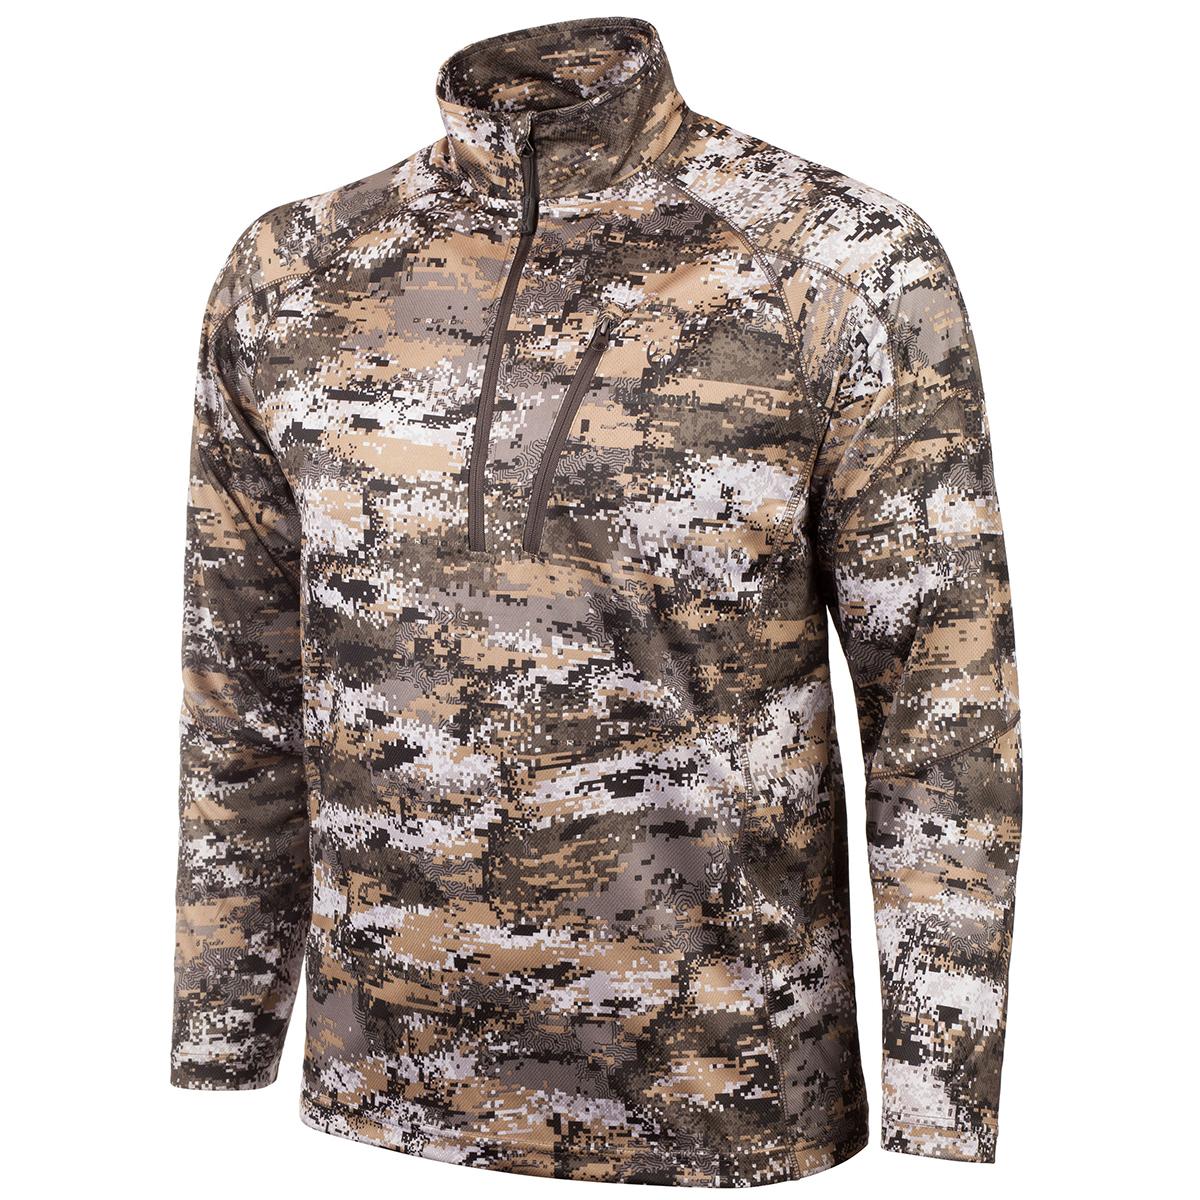 Huntworth Men's Lightweight Quarter-Zip Shirt, Disruption Camo